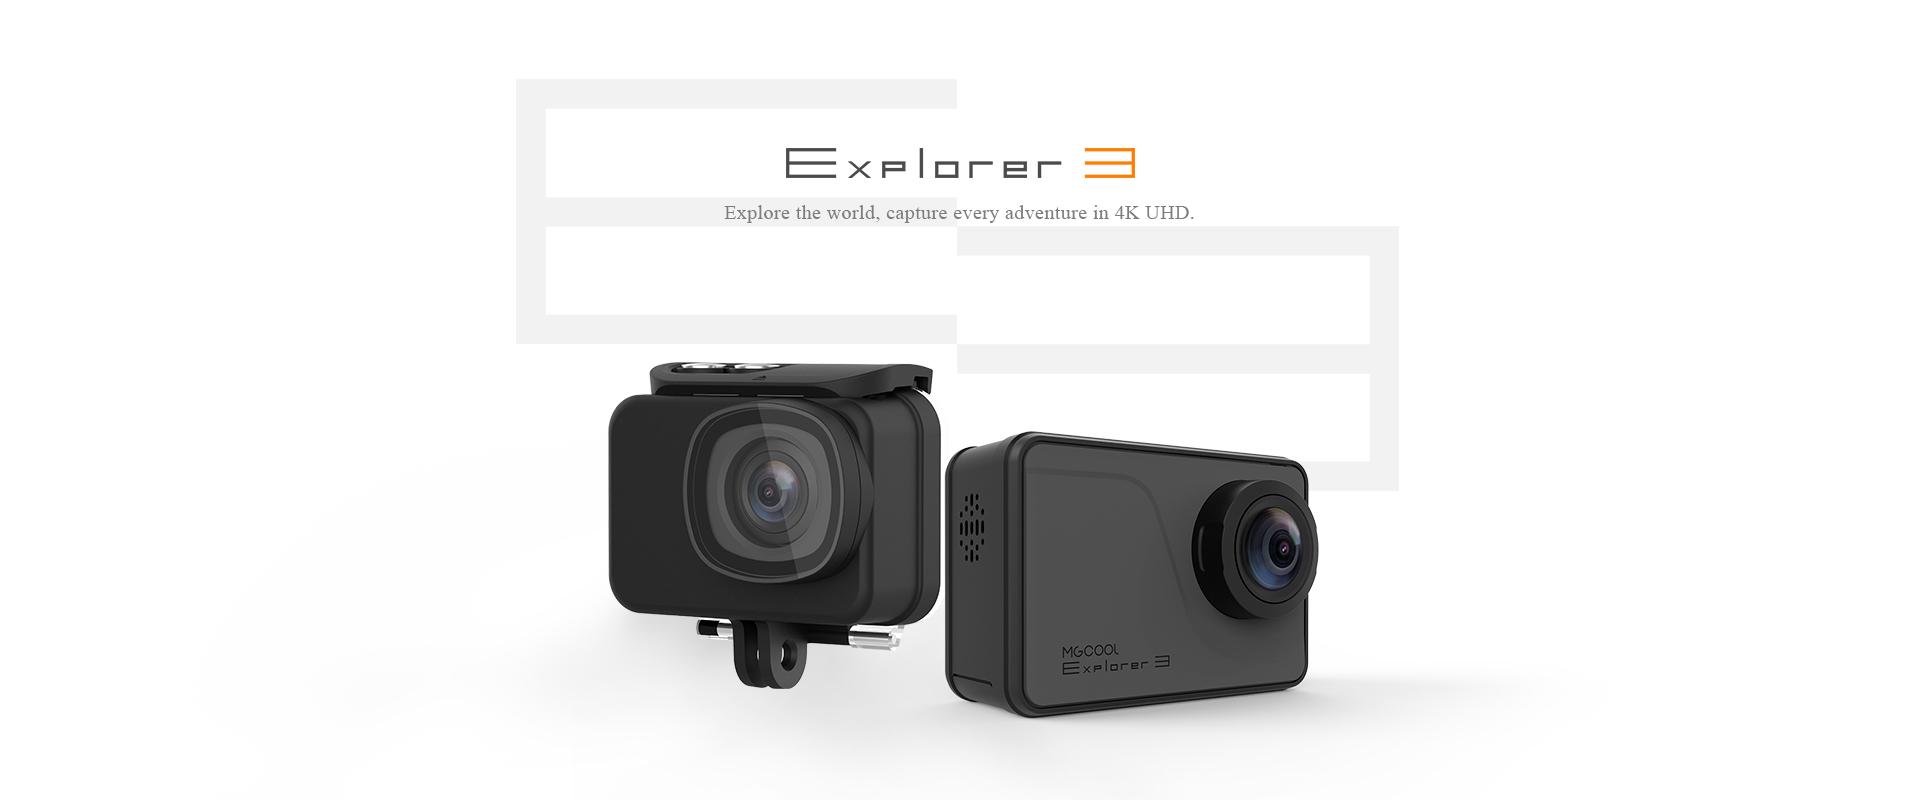 Blognews24.com|MGCOOL Explorer native 4k action camera